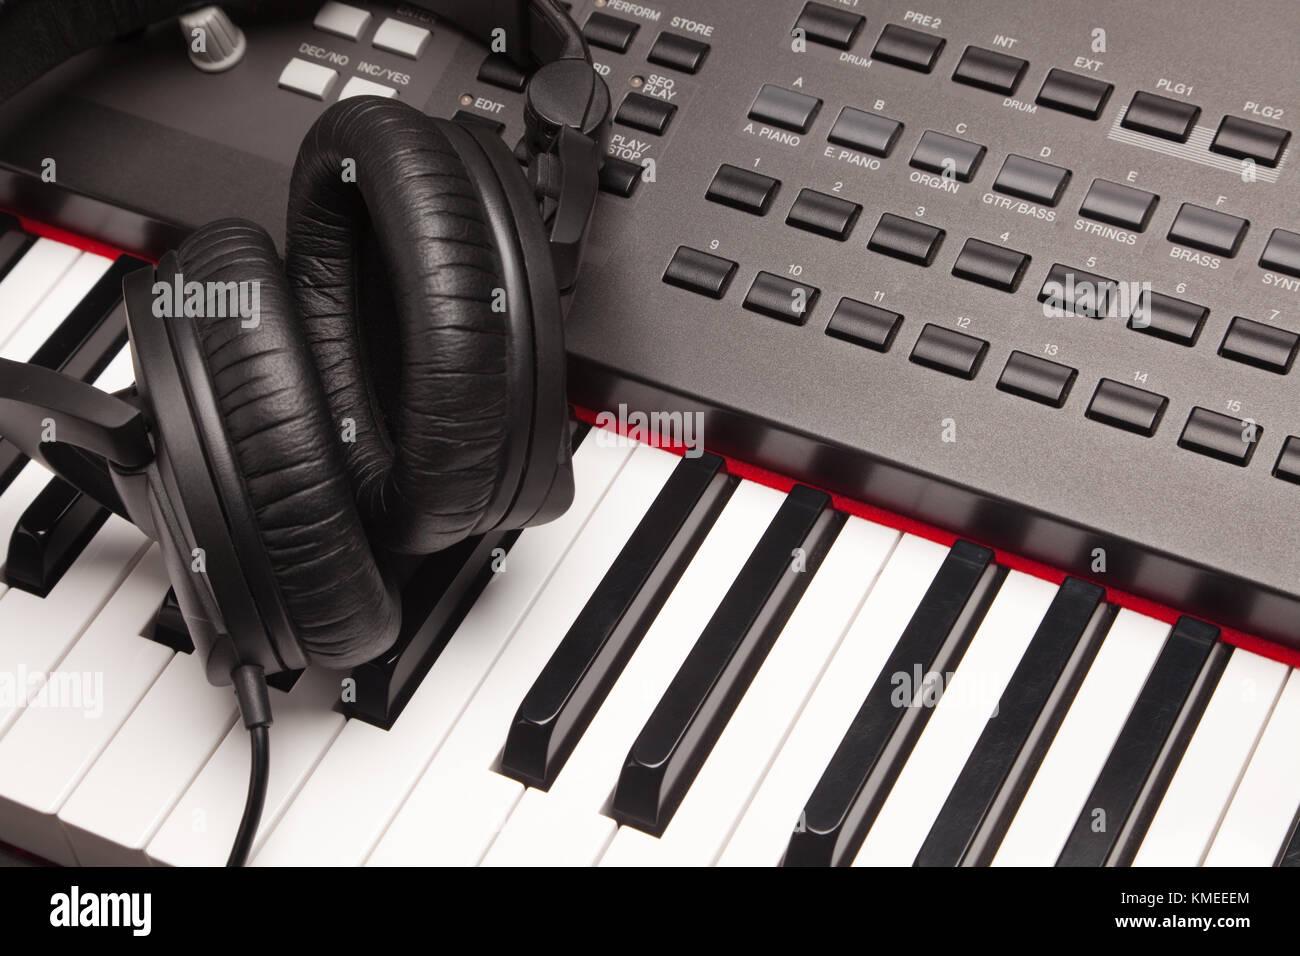 Listening Headphones Laying on Electronic Synthesizer Keyboard. - Stock Image